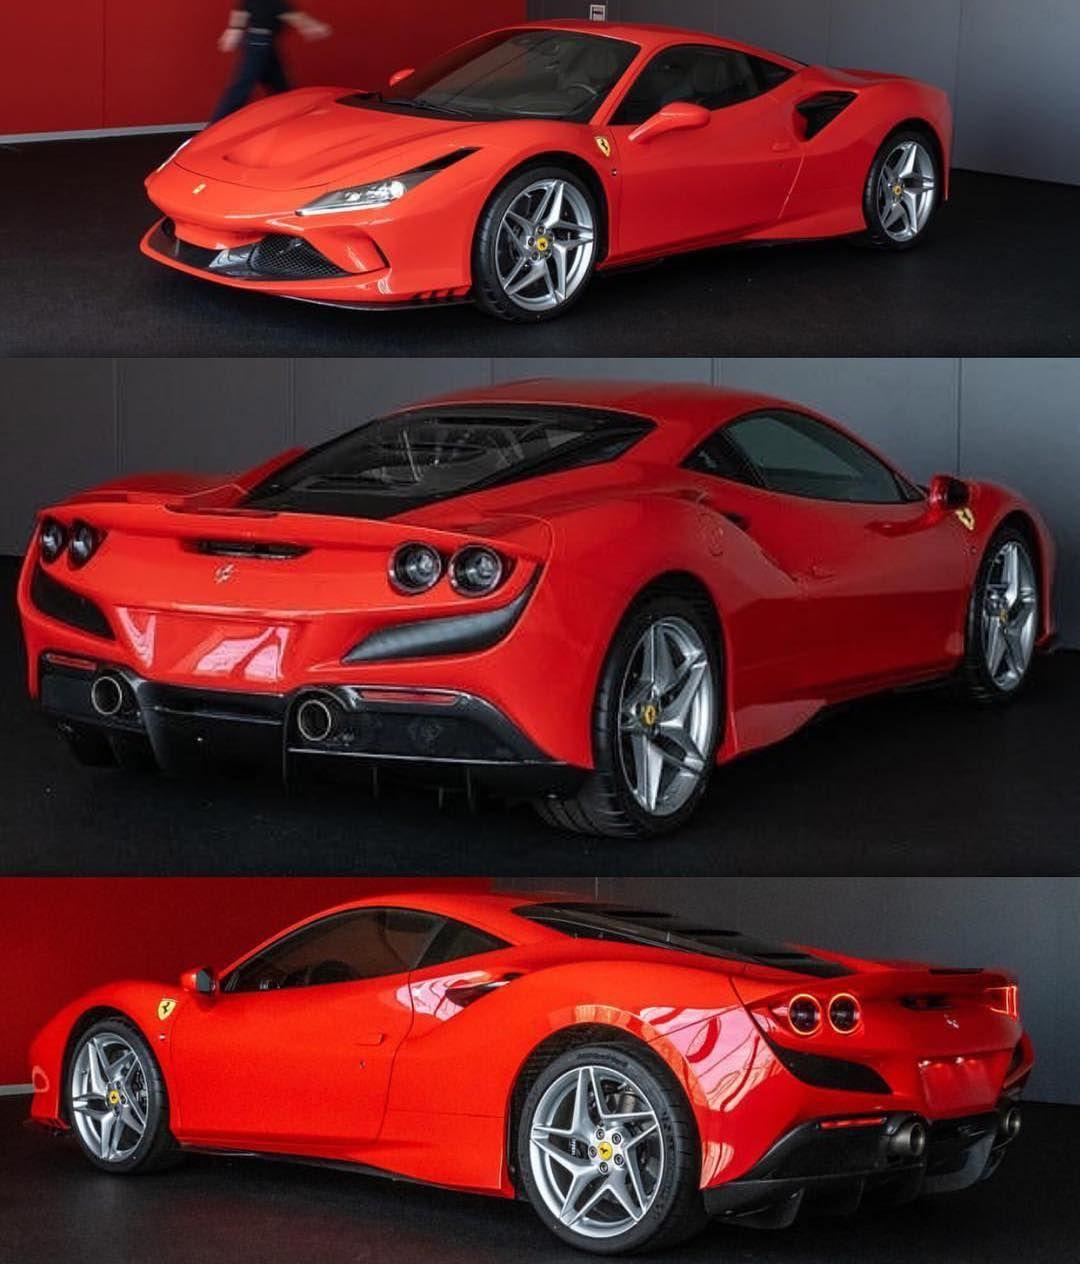 Immagini F8 Tributo Ferrari: 素敵な車, フェラーリ, 自動車